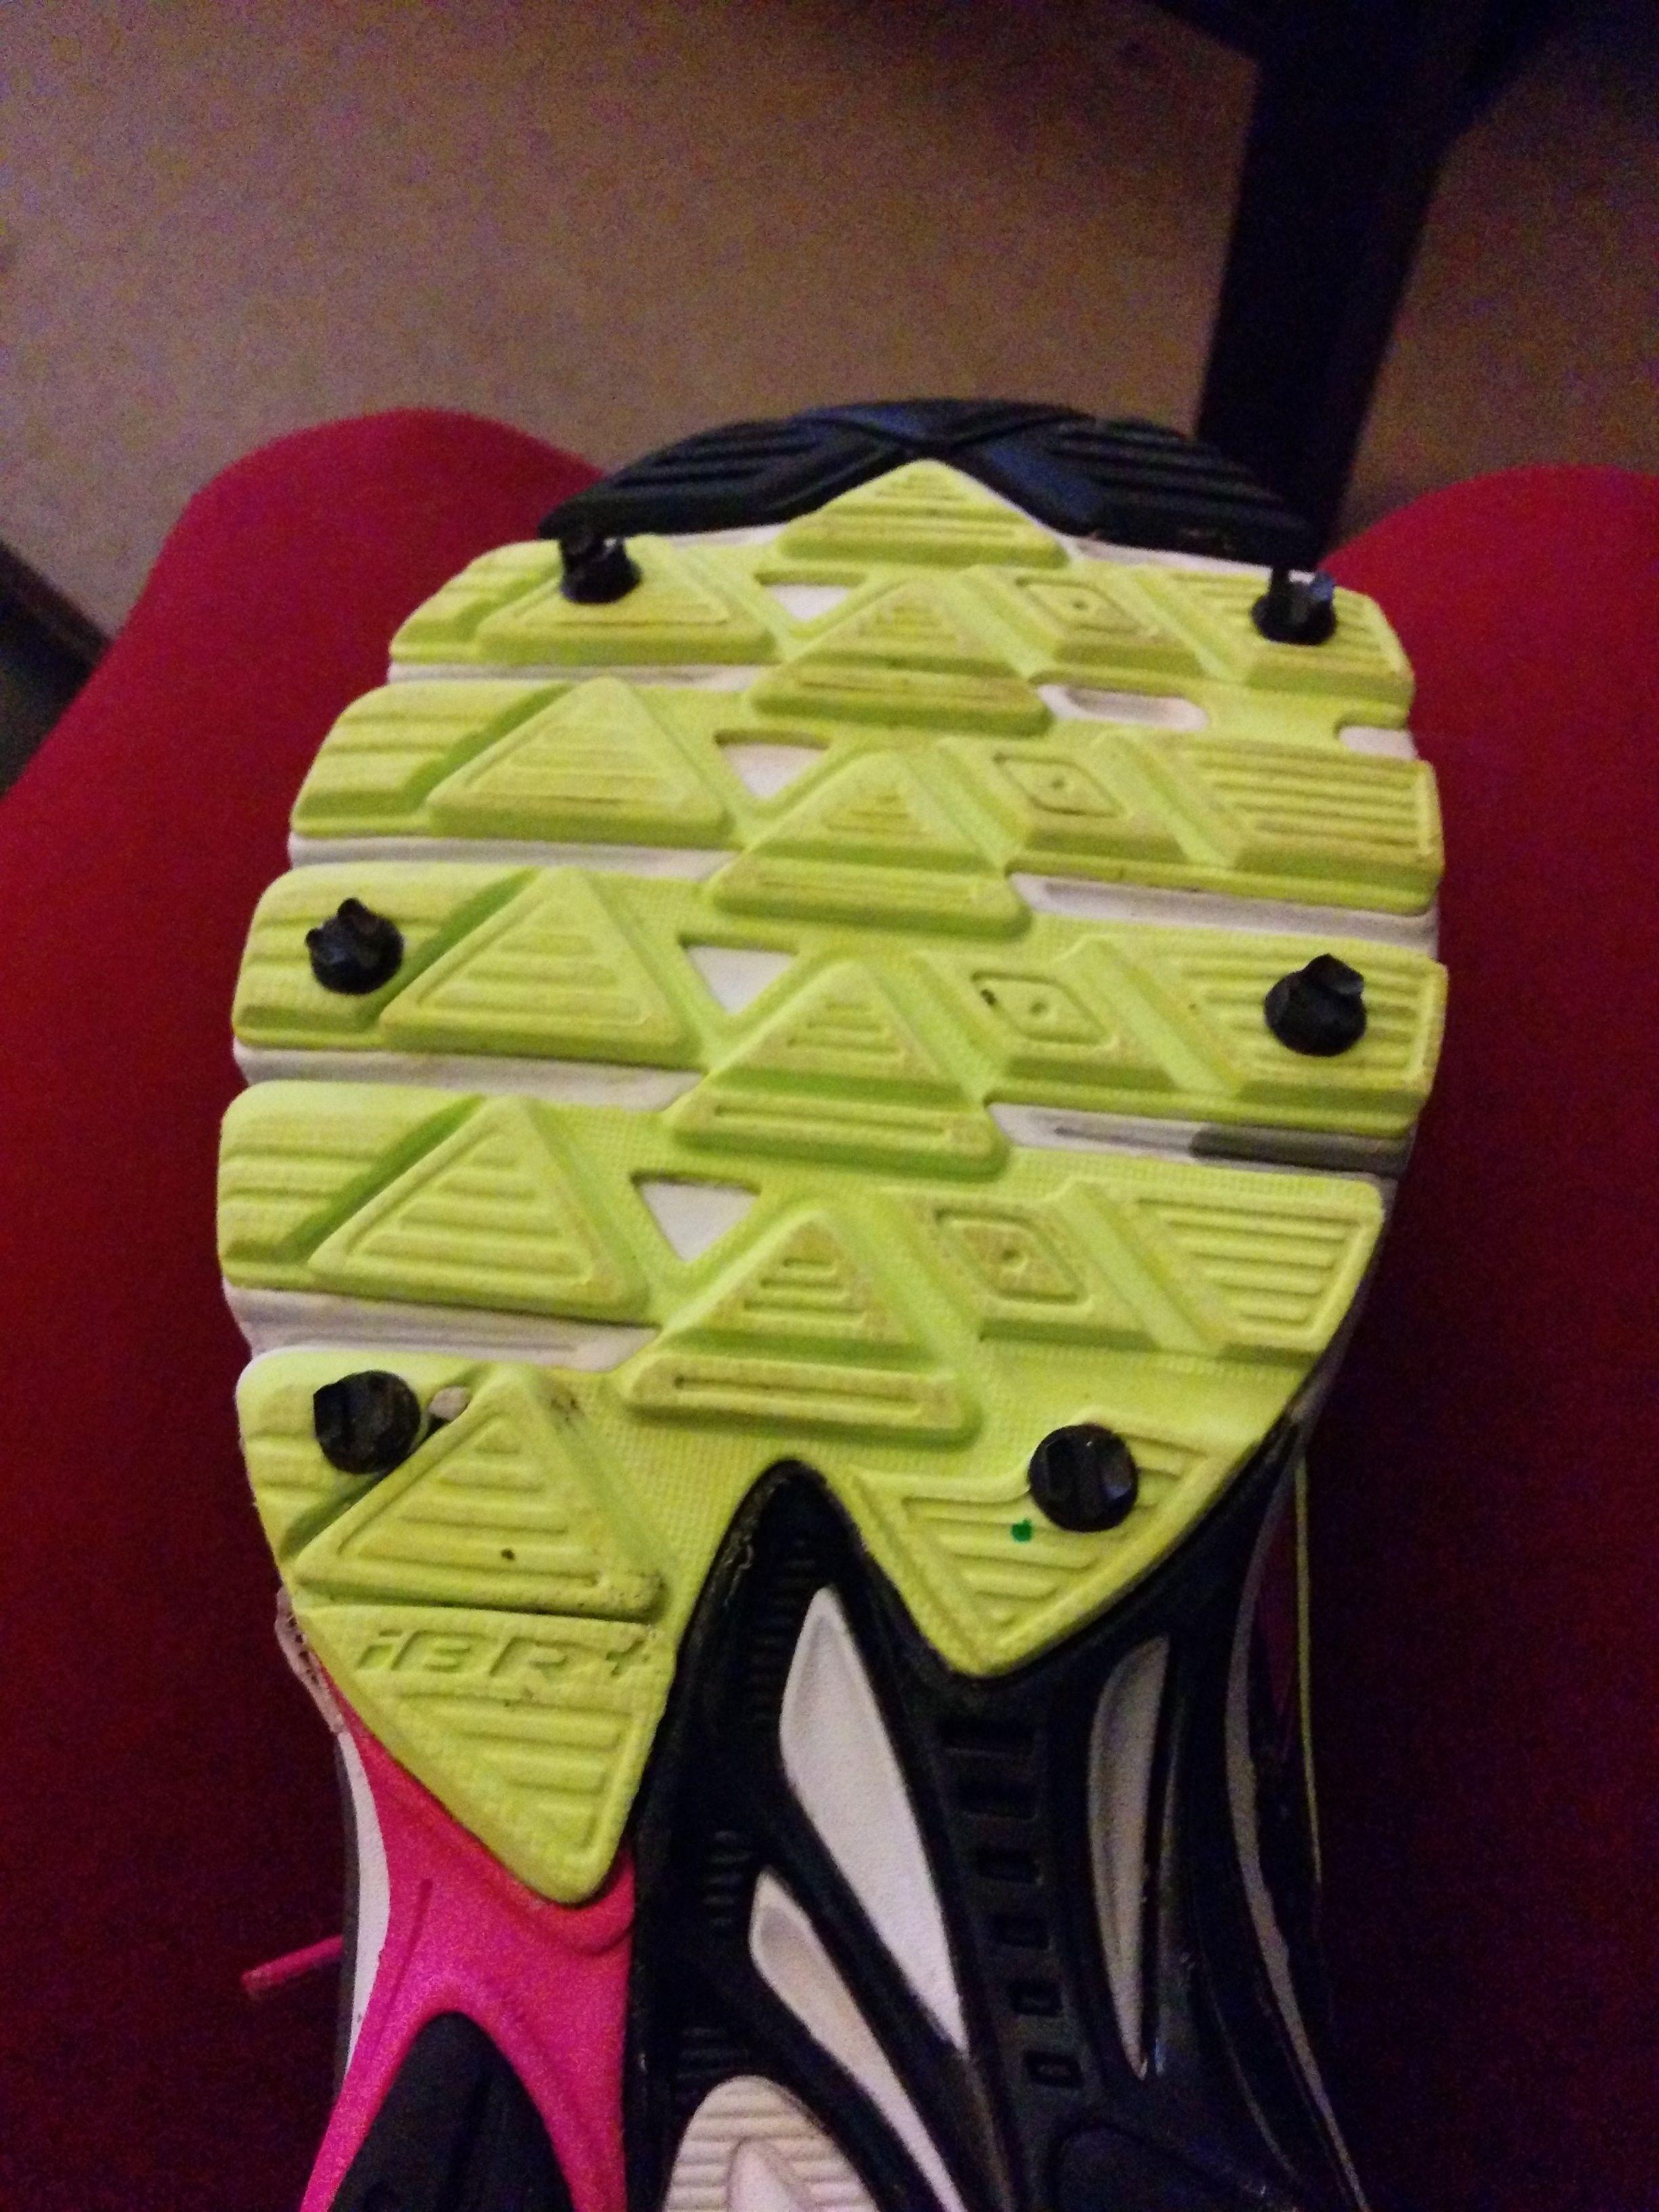 winter running spikes